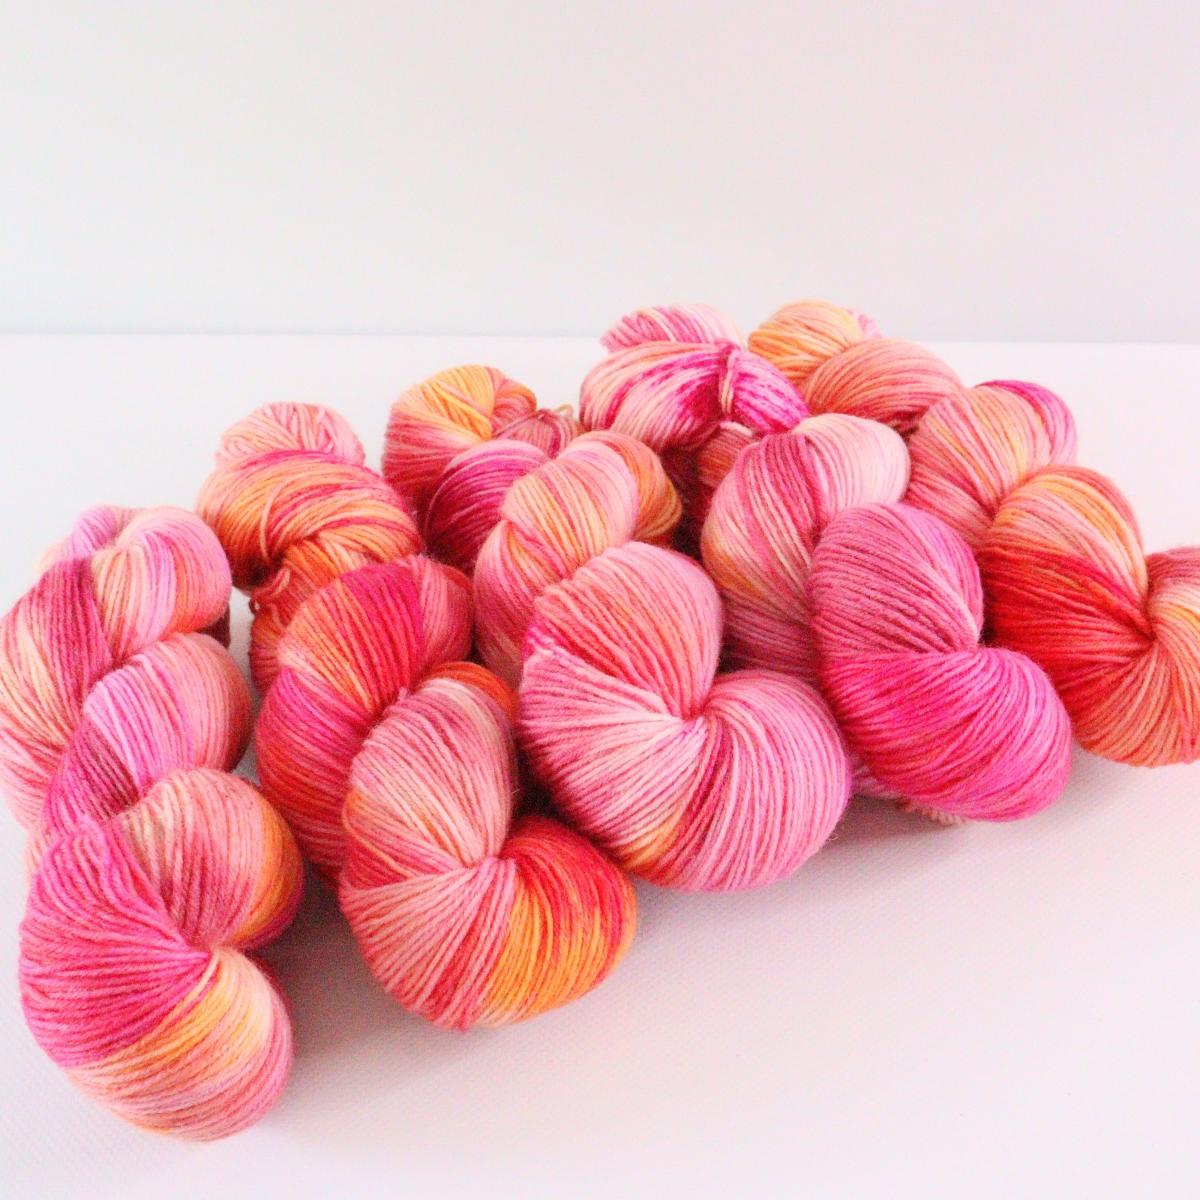 woodico.pro hand dyed yarn 076 1200x1200 - Hand dyed yarn / 076